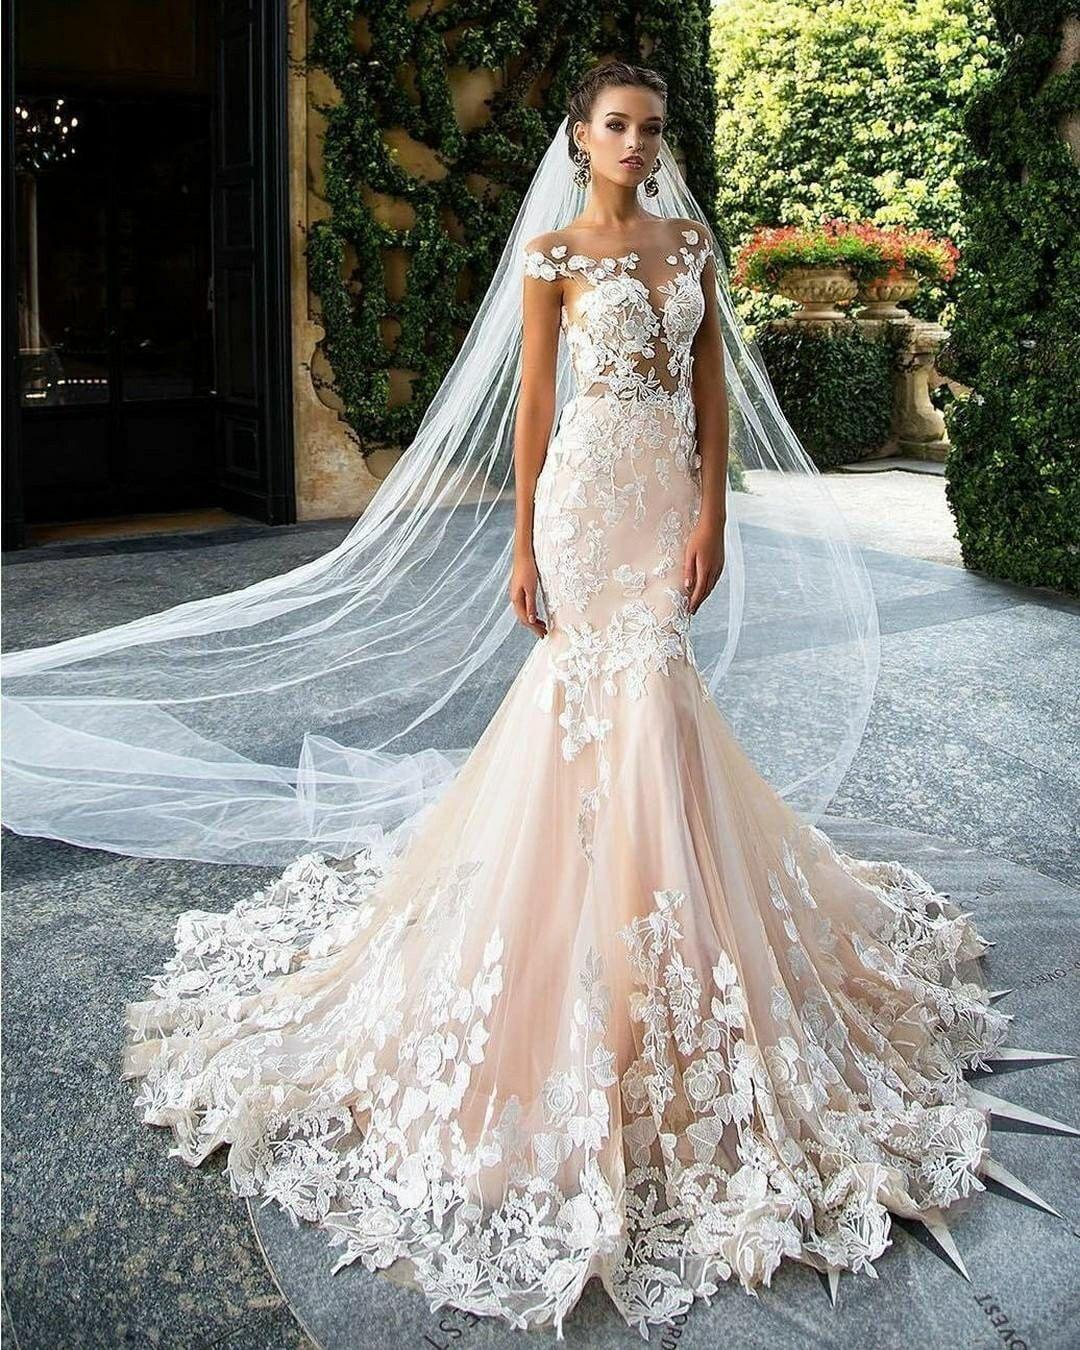 Wedding dress pin up train  Pin by Carma Silva on estilo sirena novia  Pinterest